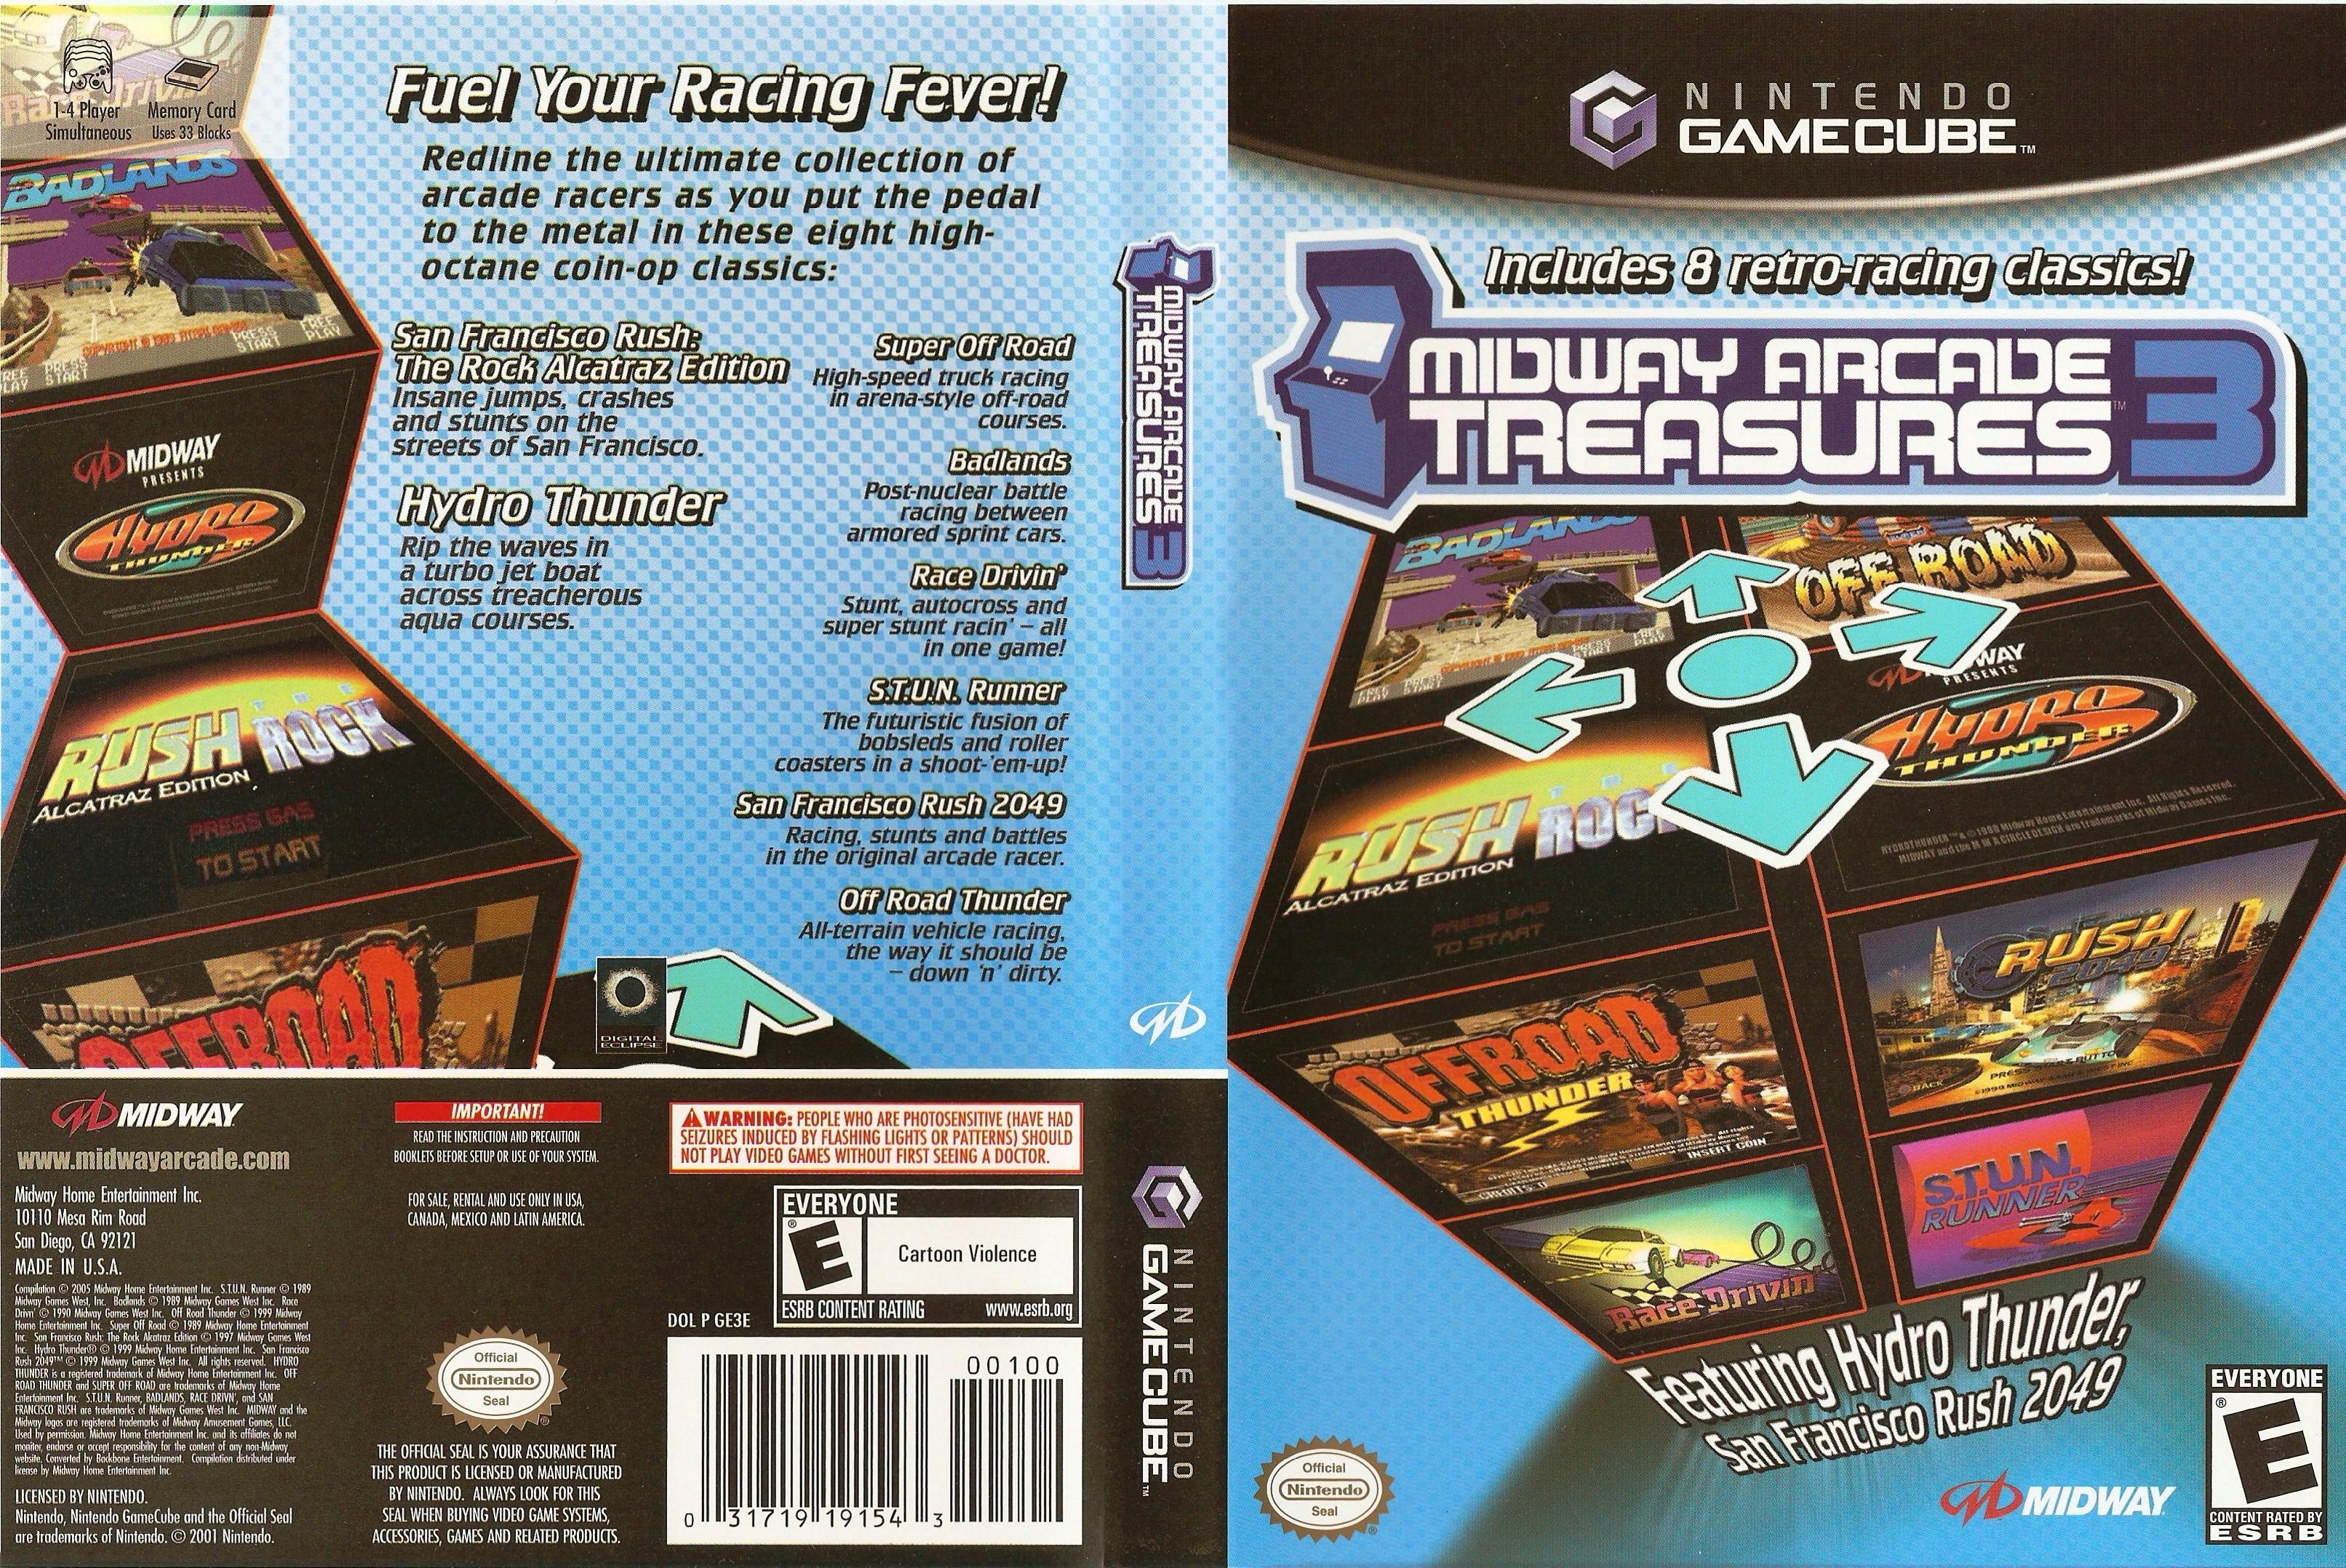 Midway Arcade Treasures 3 ISO